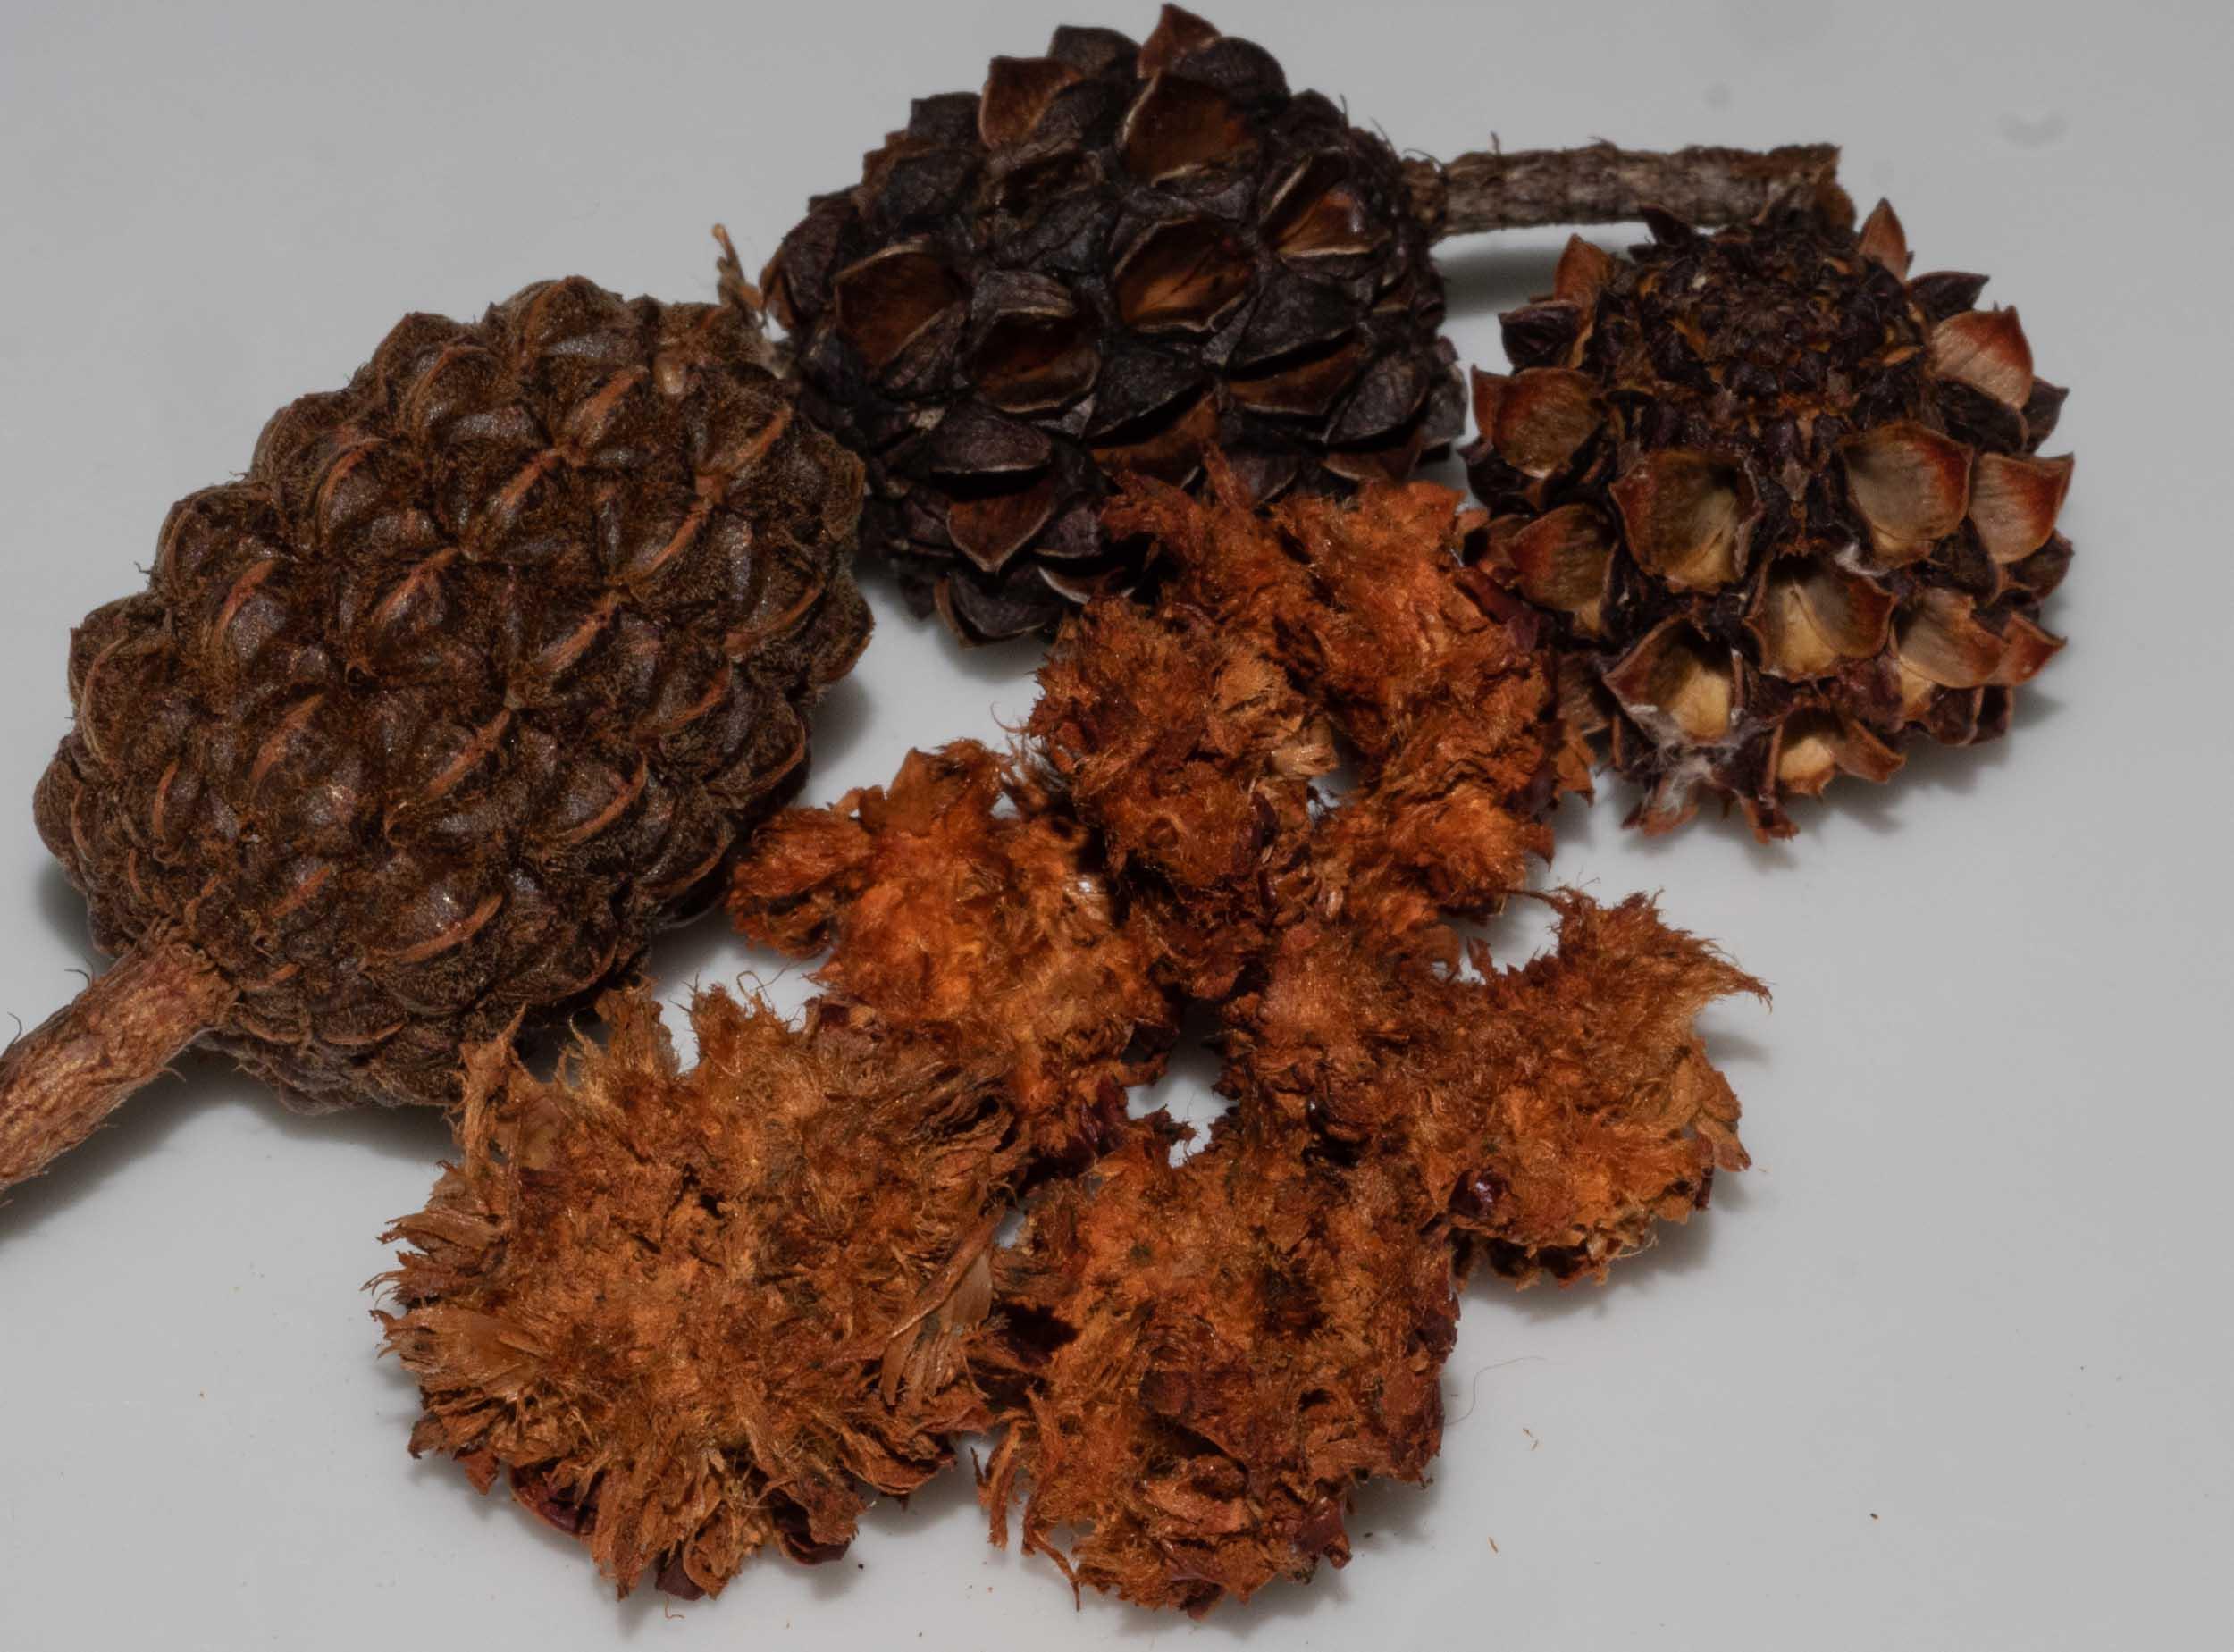 Allocasuarina fruit